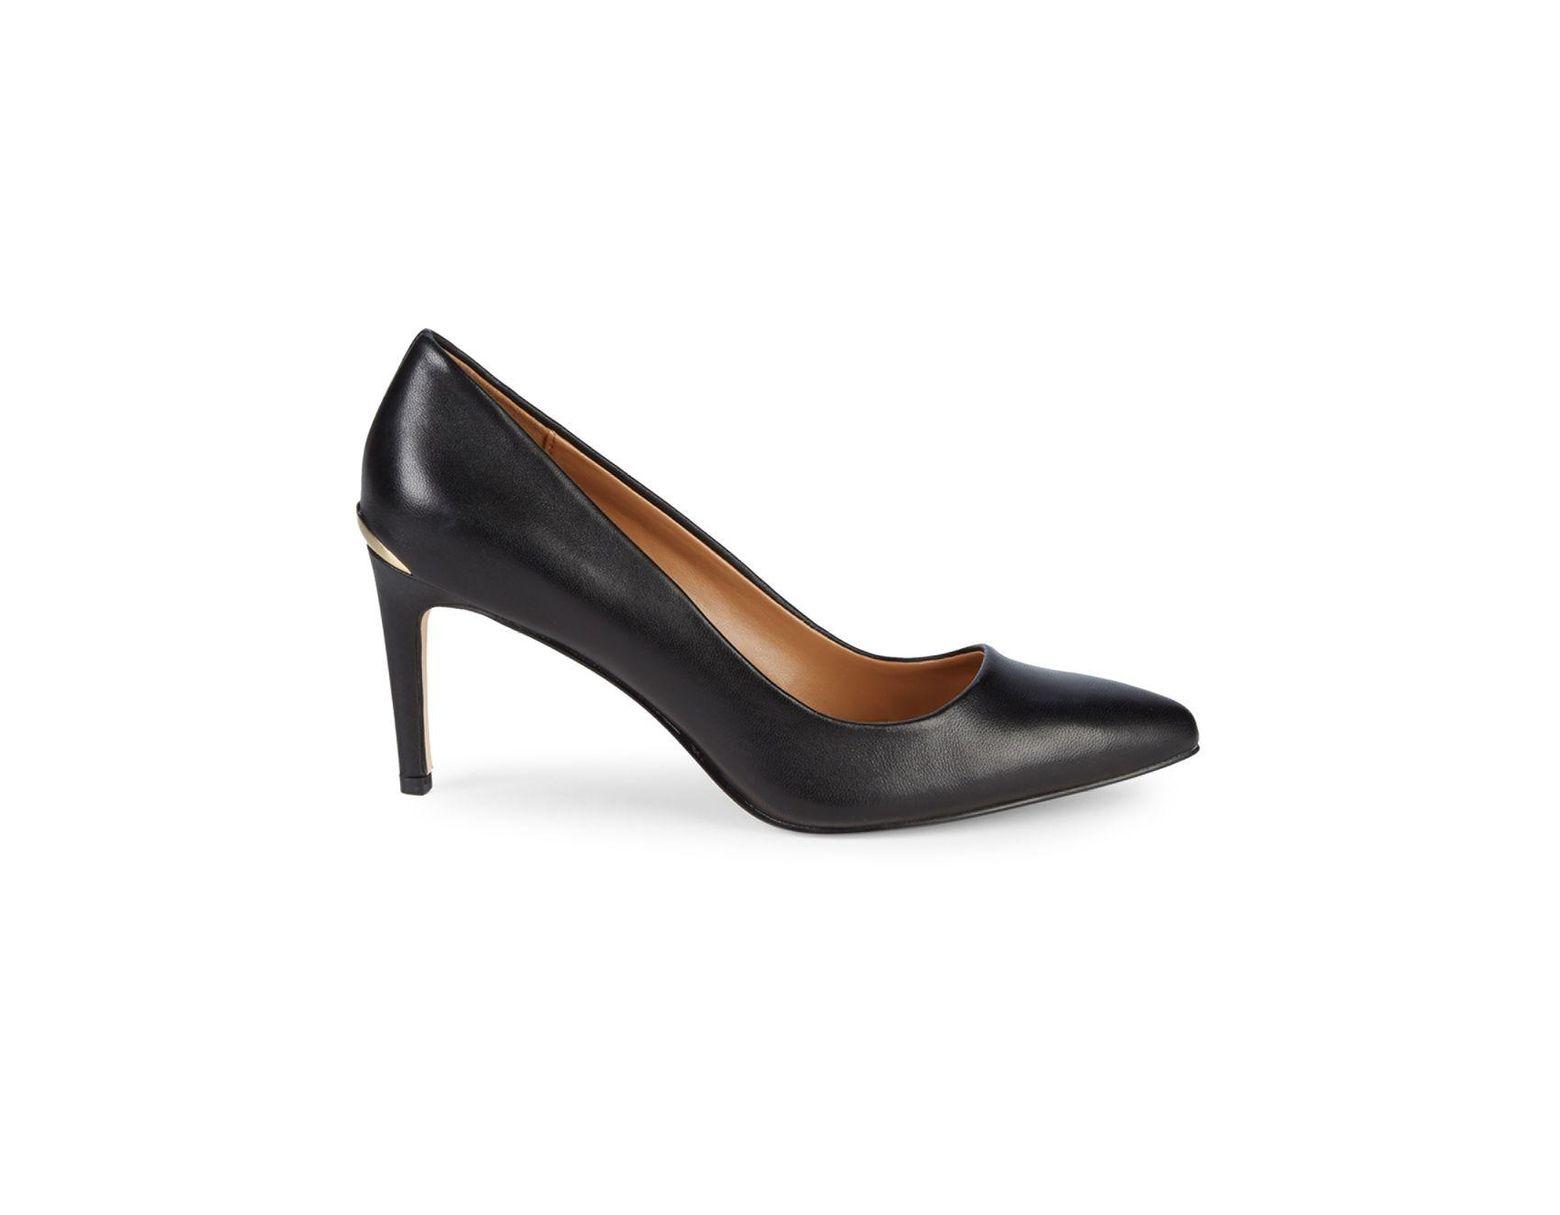 b0a71438e31 Women's Black Kirstin Leather Pumps